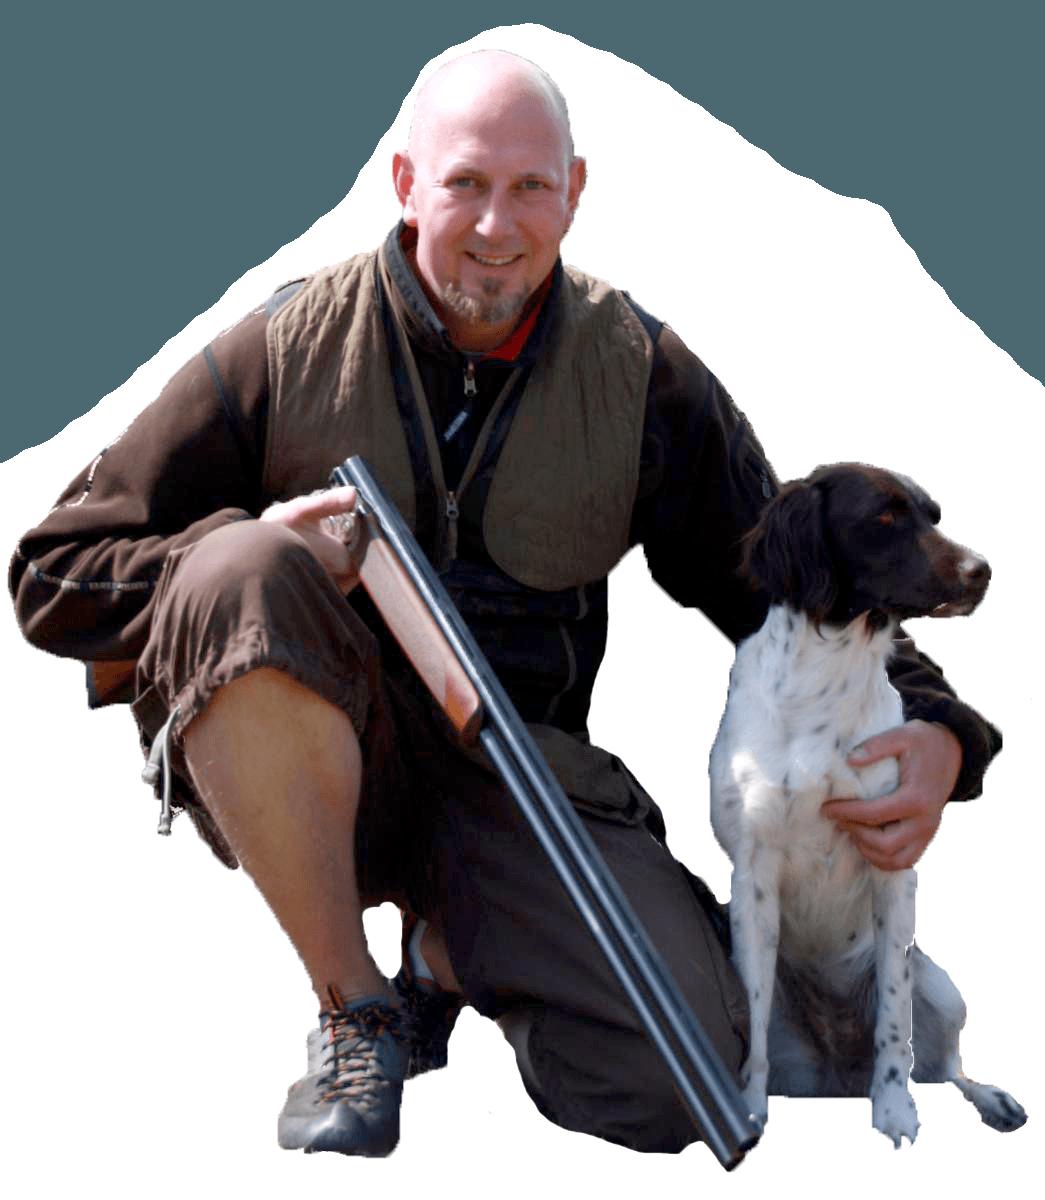 jagttegnslærer og hund